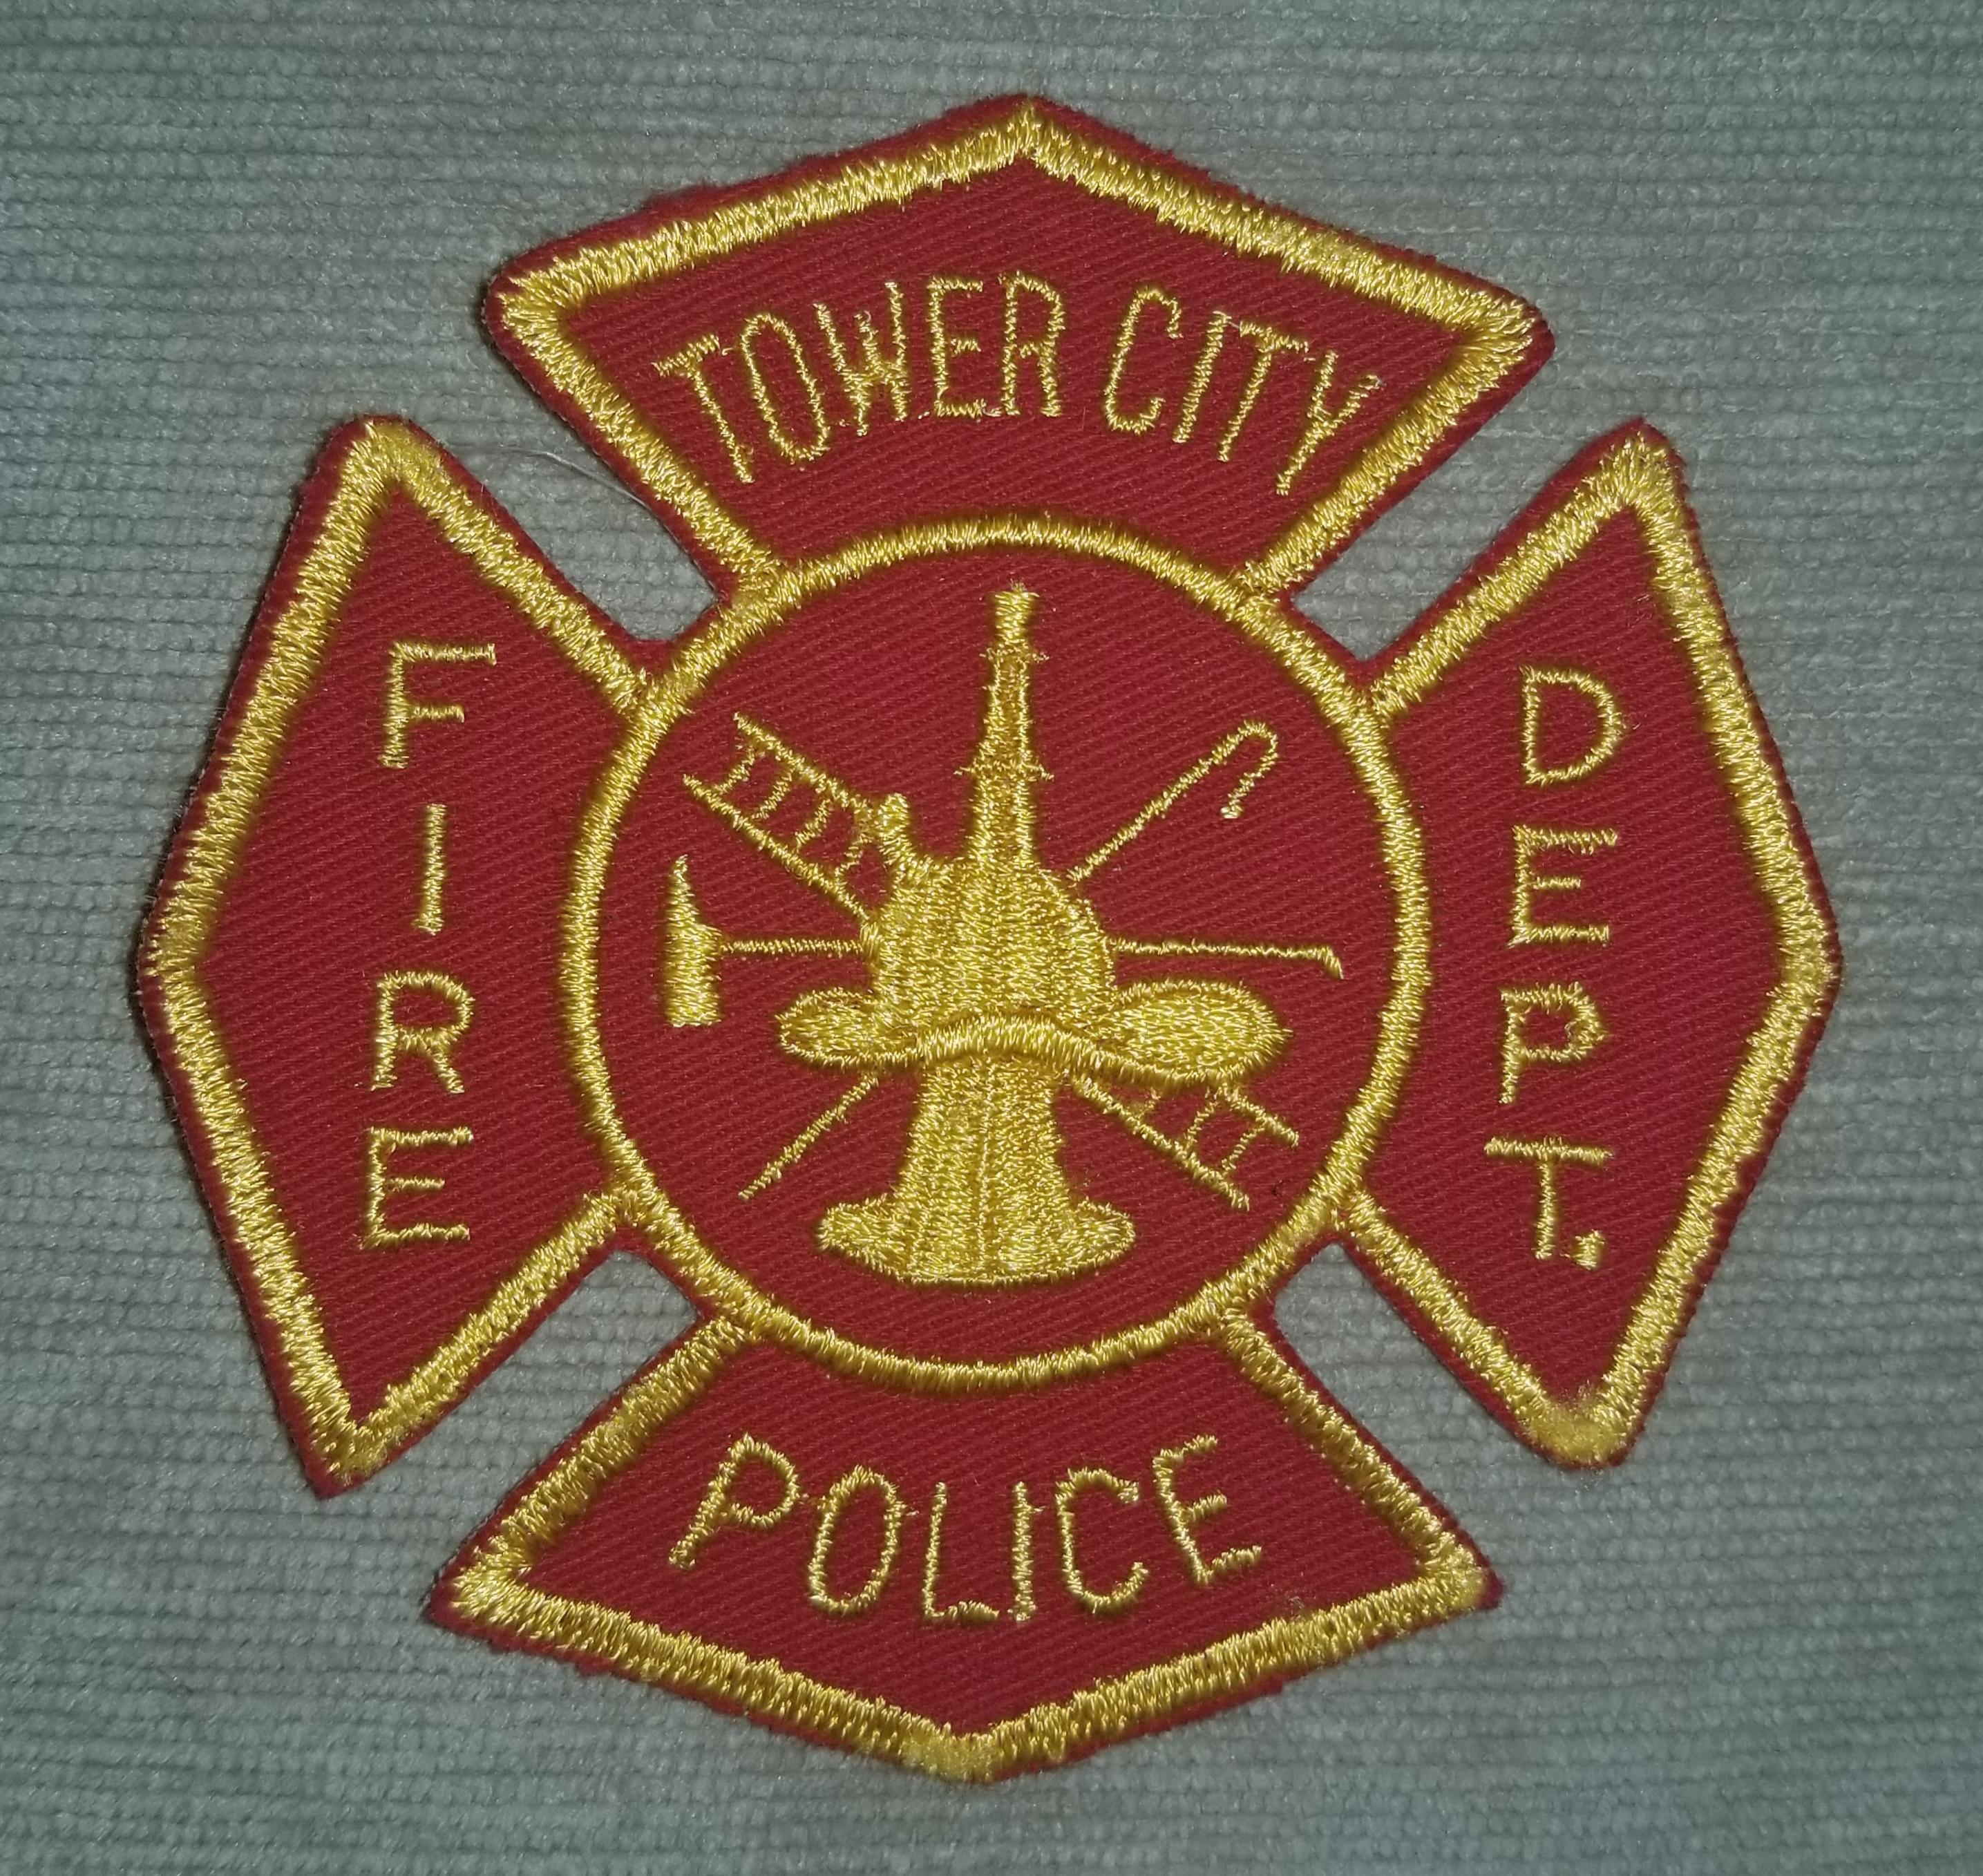 Tower City Volunte Fire Company Fire Pol